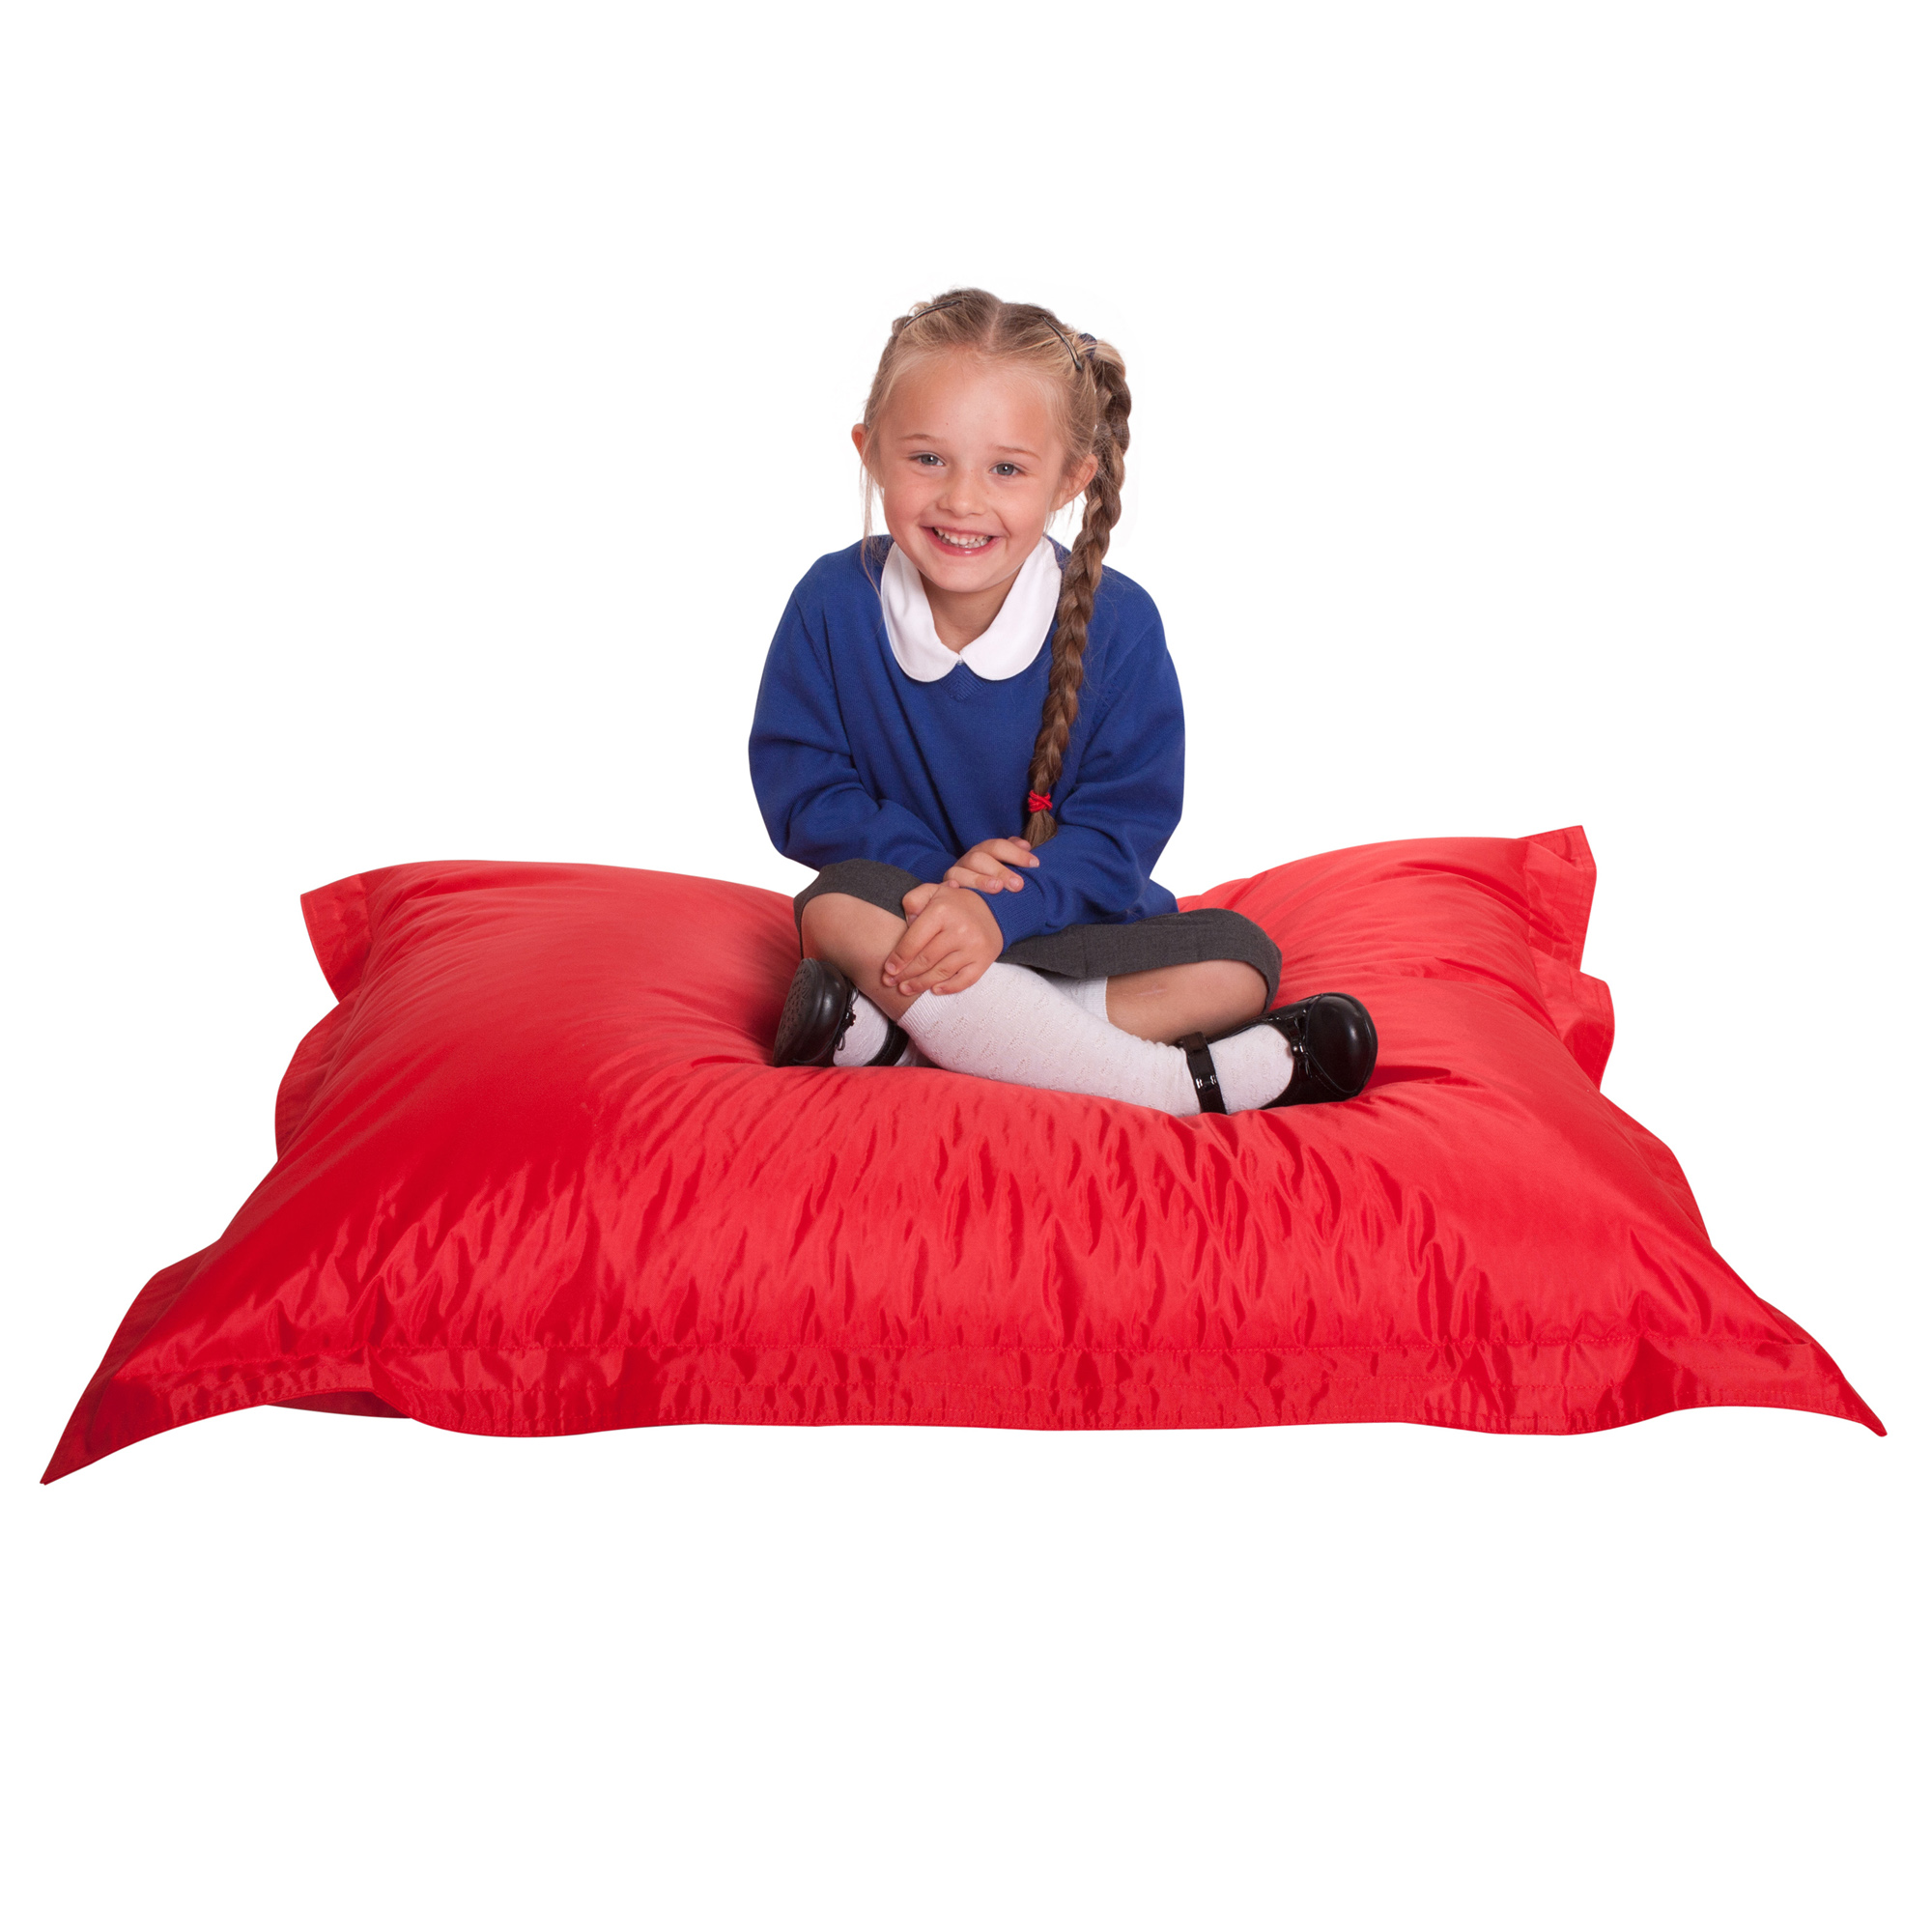 Eden-Childrens-Giant-Cushion-red-300dpi